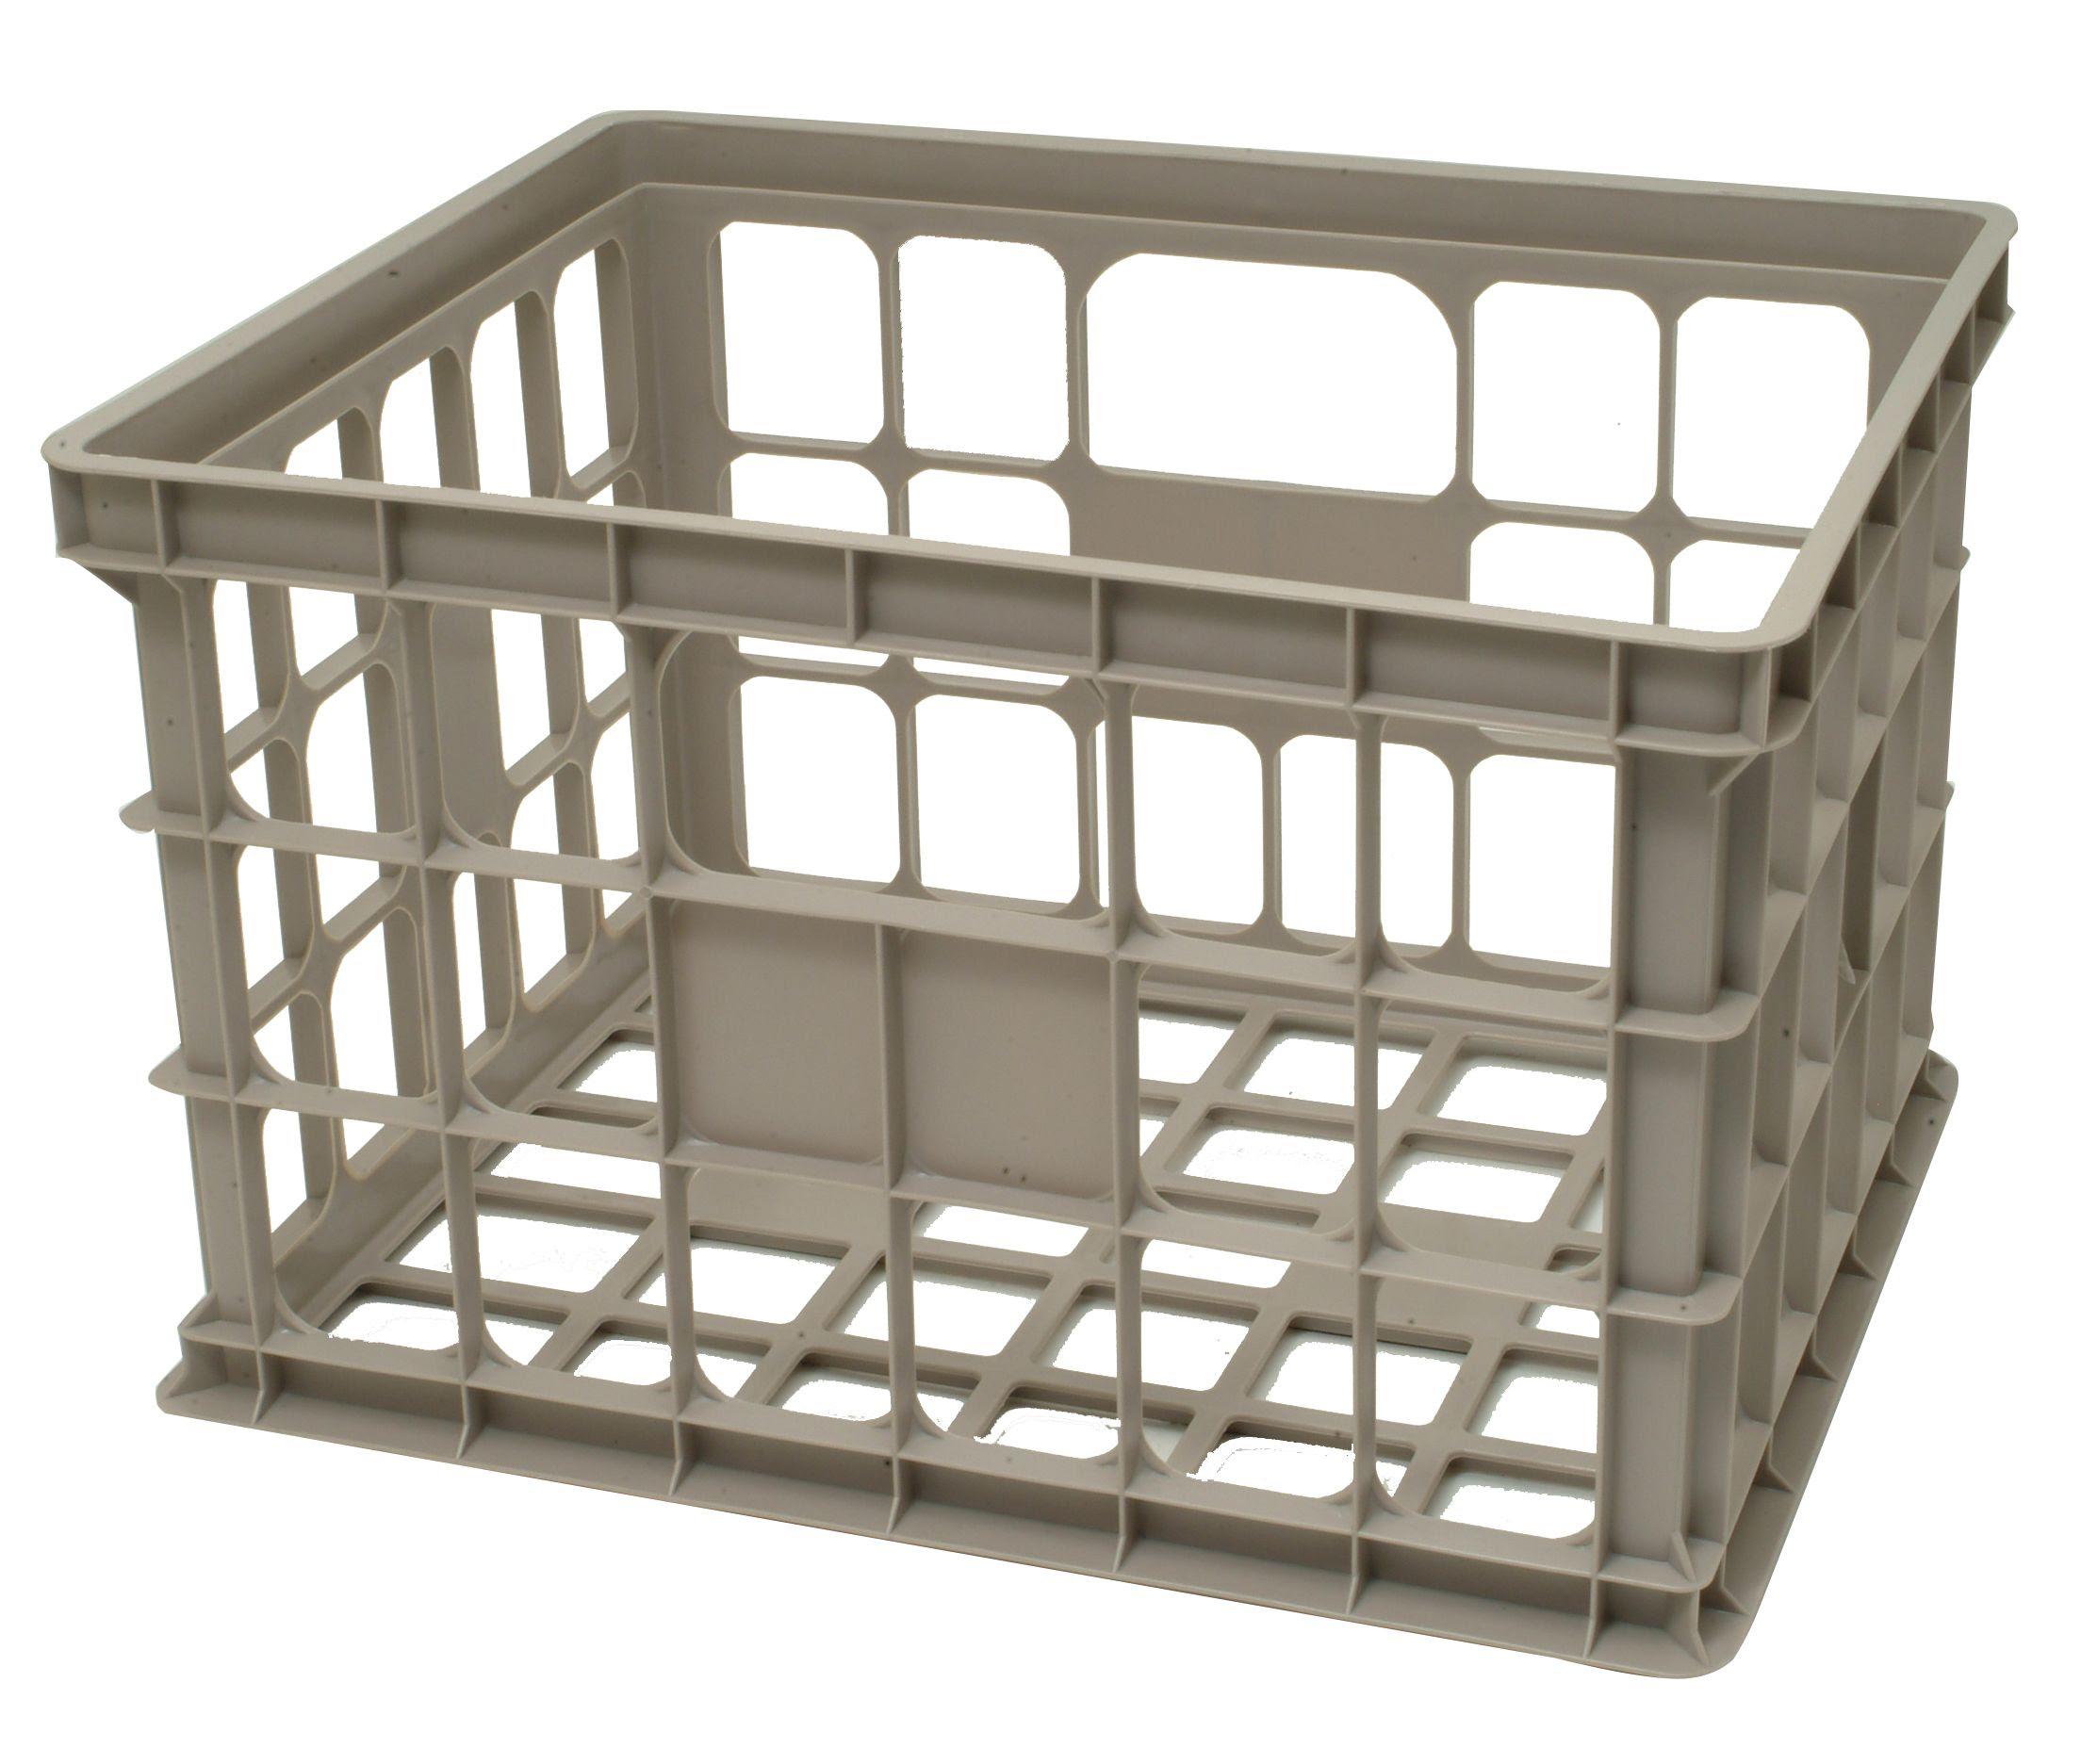 http://www.kmart.com/united-plastics-large-crate-clay/p-9990000034592611P